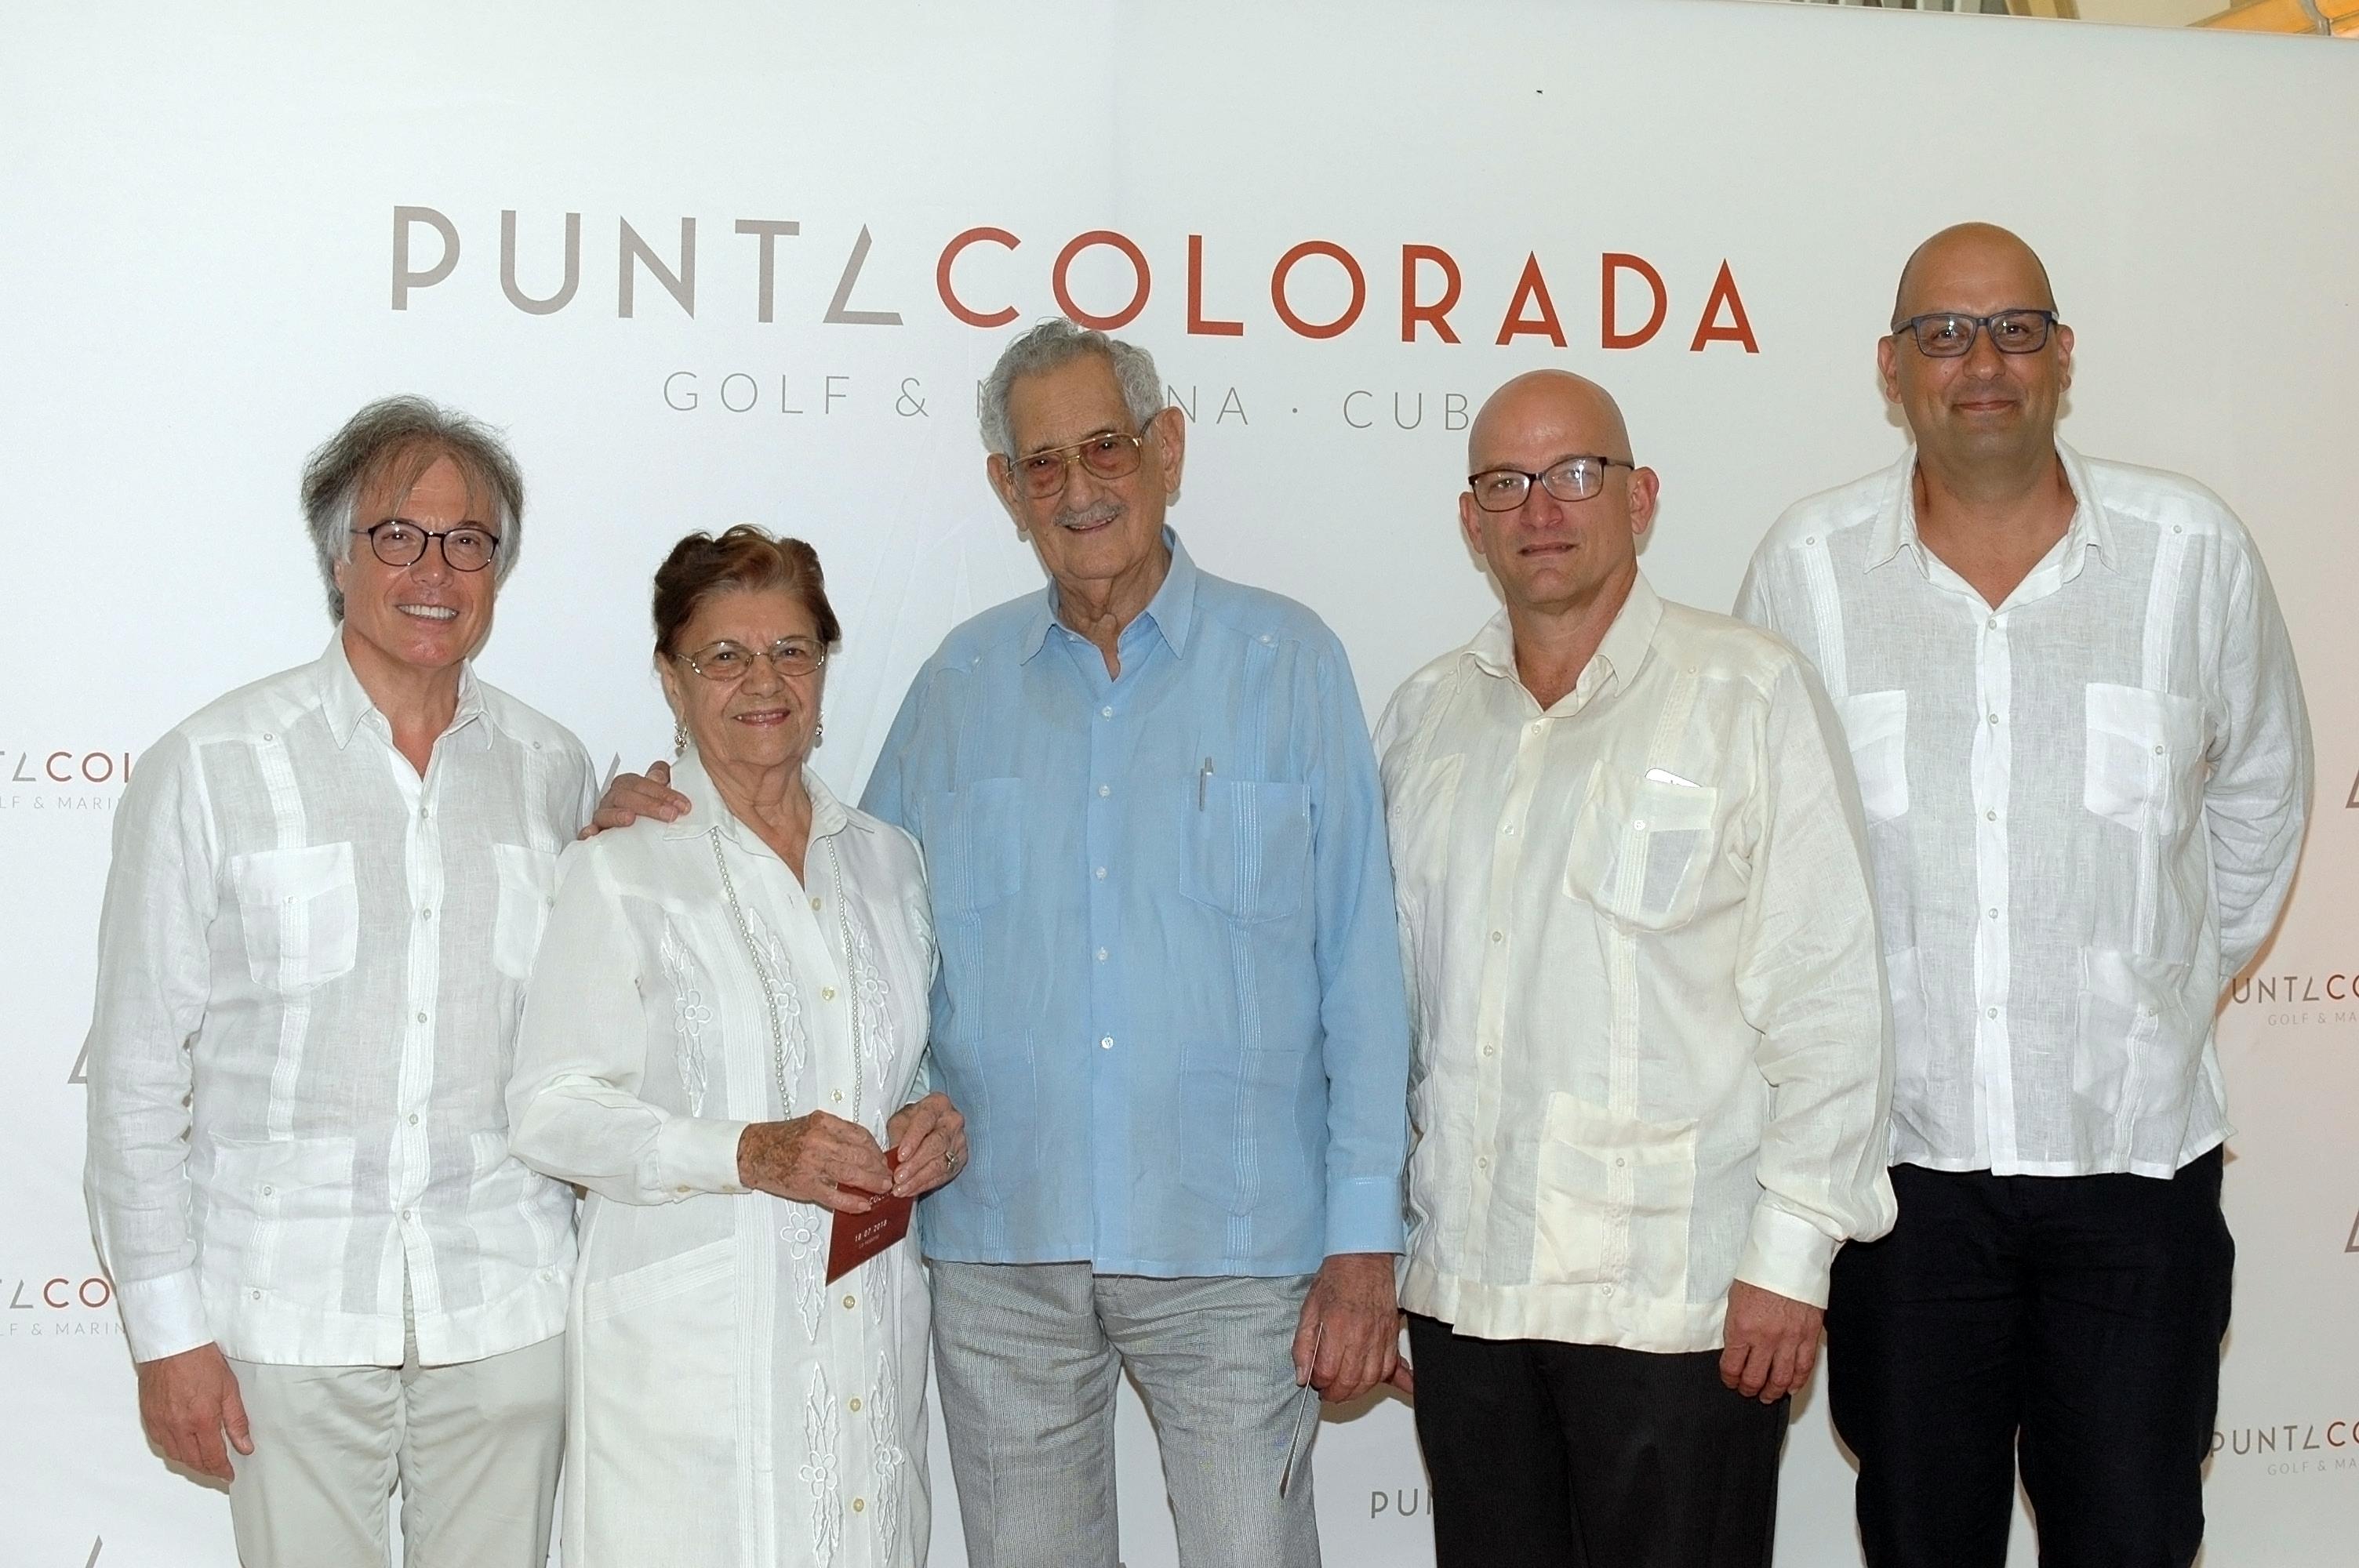 Presentan megaproyecto de golf, marinas, hoteles e inmobiliaria Punta Colorada *